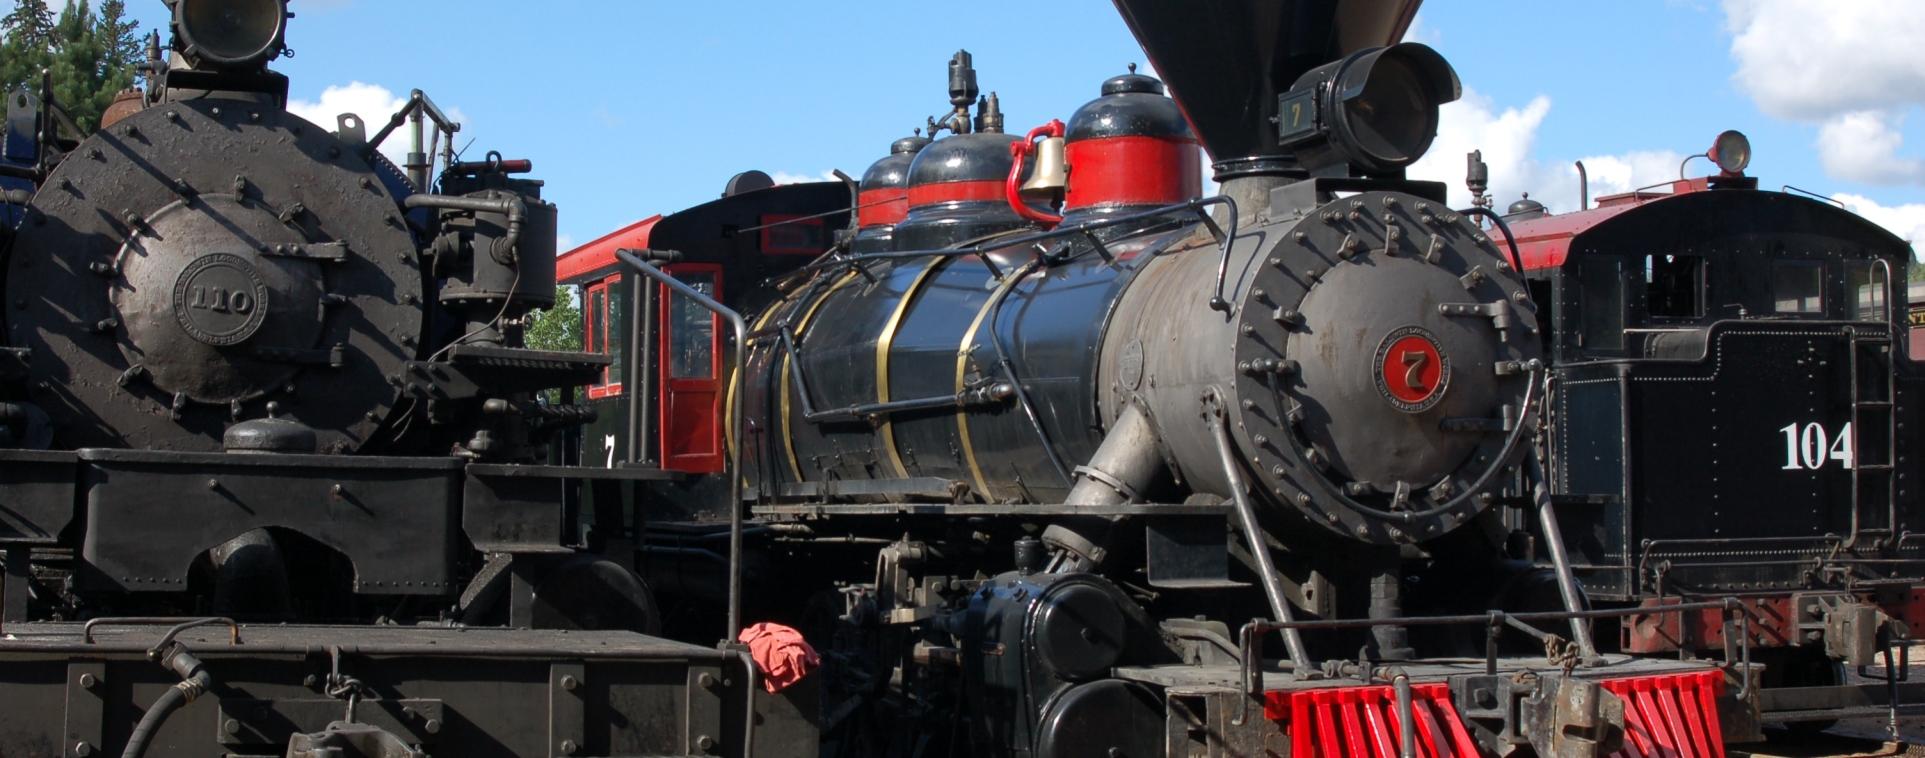 Clipart north dakota state museum black and white clip black and white South Dakota State Railroad Museum | Black Hills & Badlands - South ... clip black and white